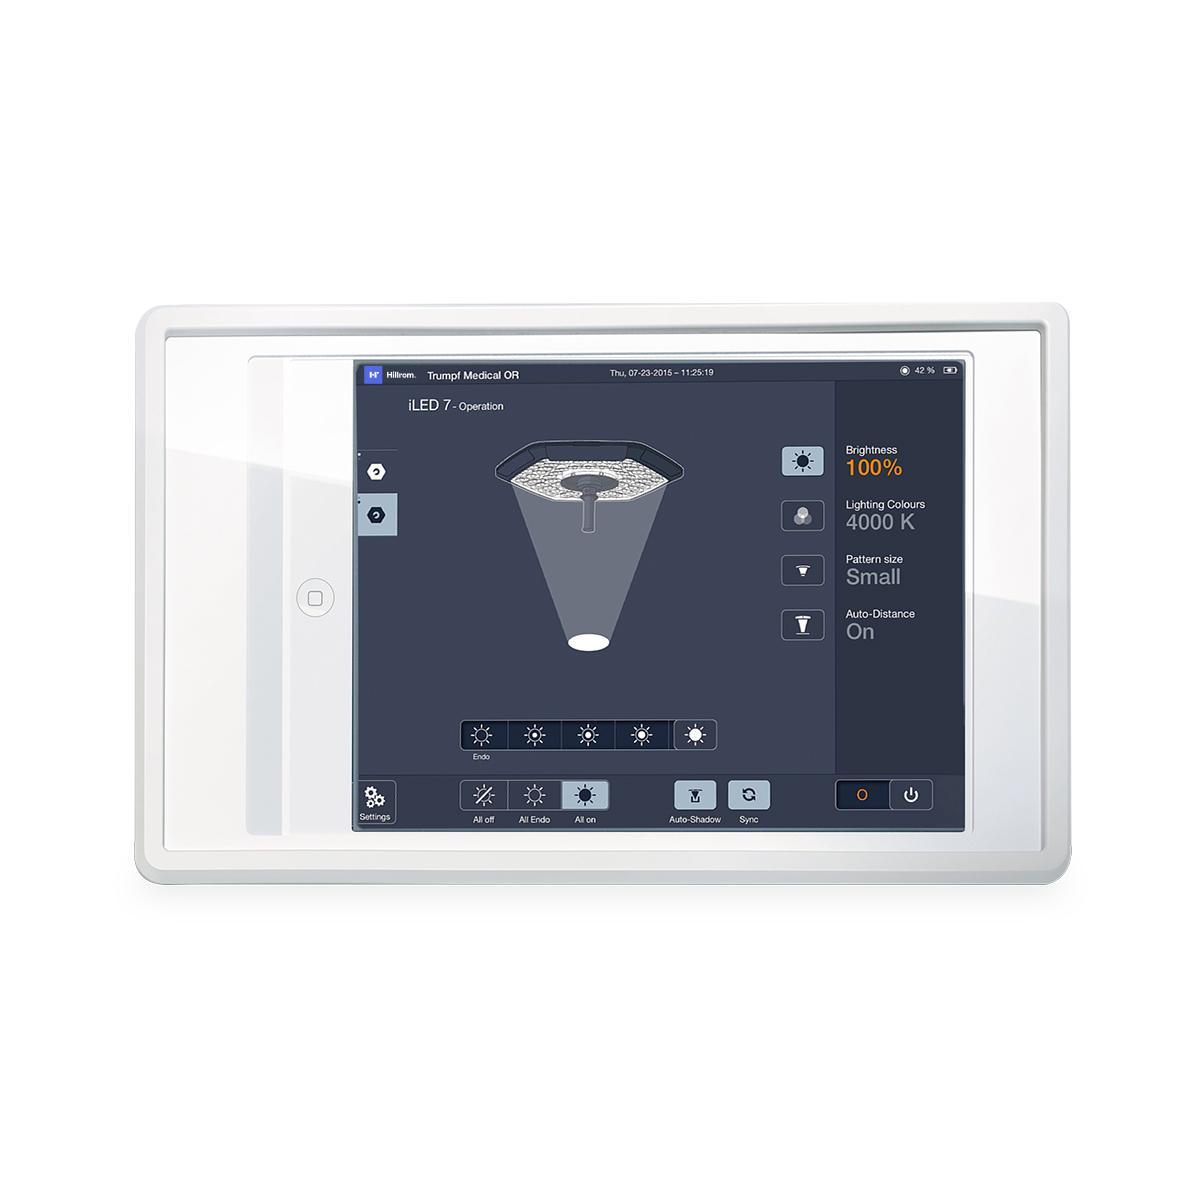 iLED 7, SmartControl iPAD